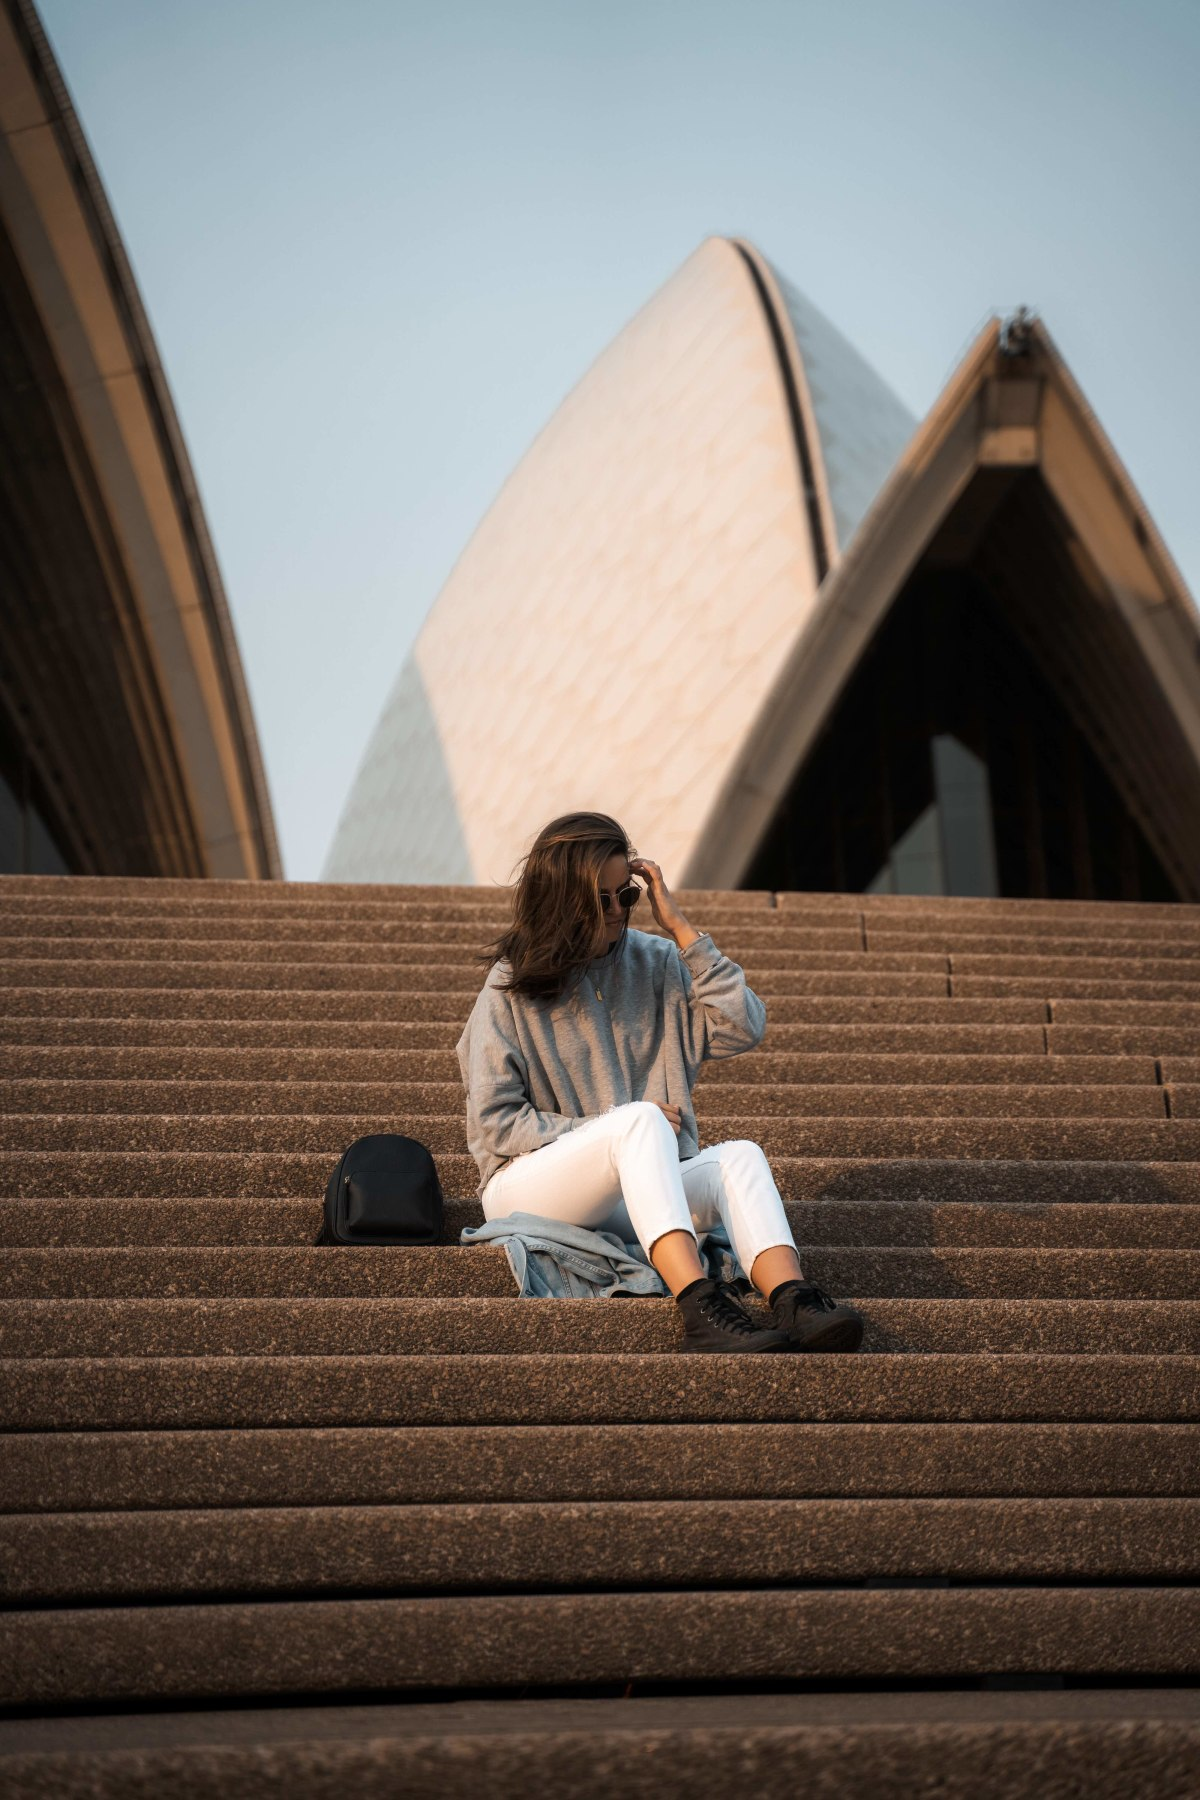 Iconic - Opera House Steps